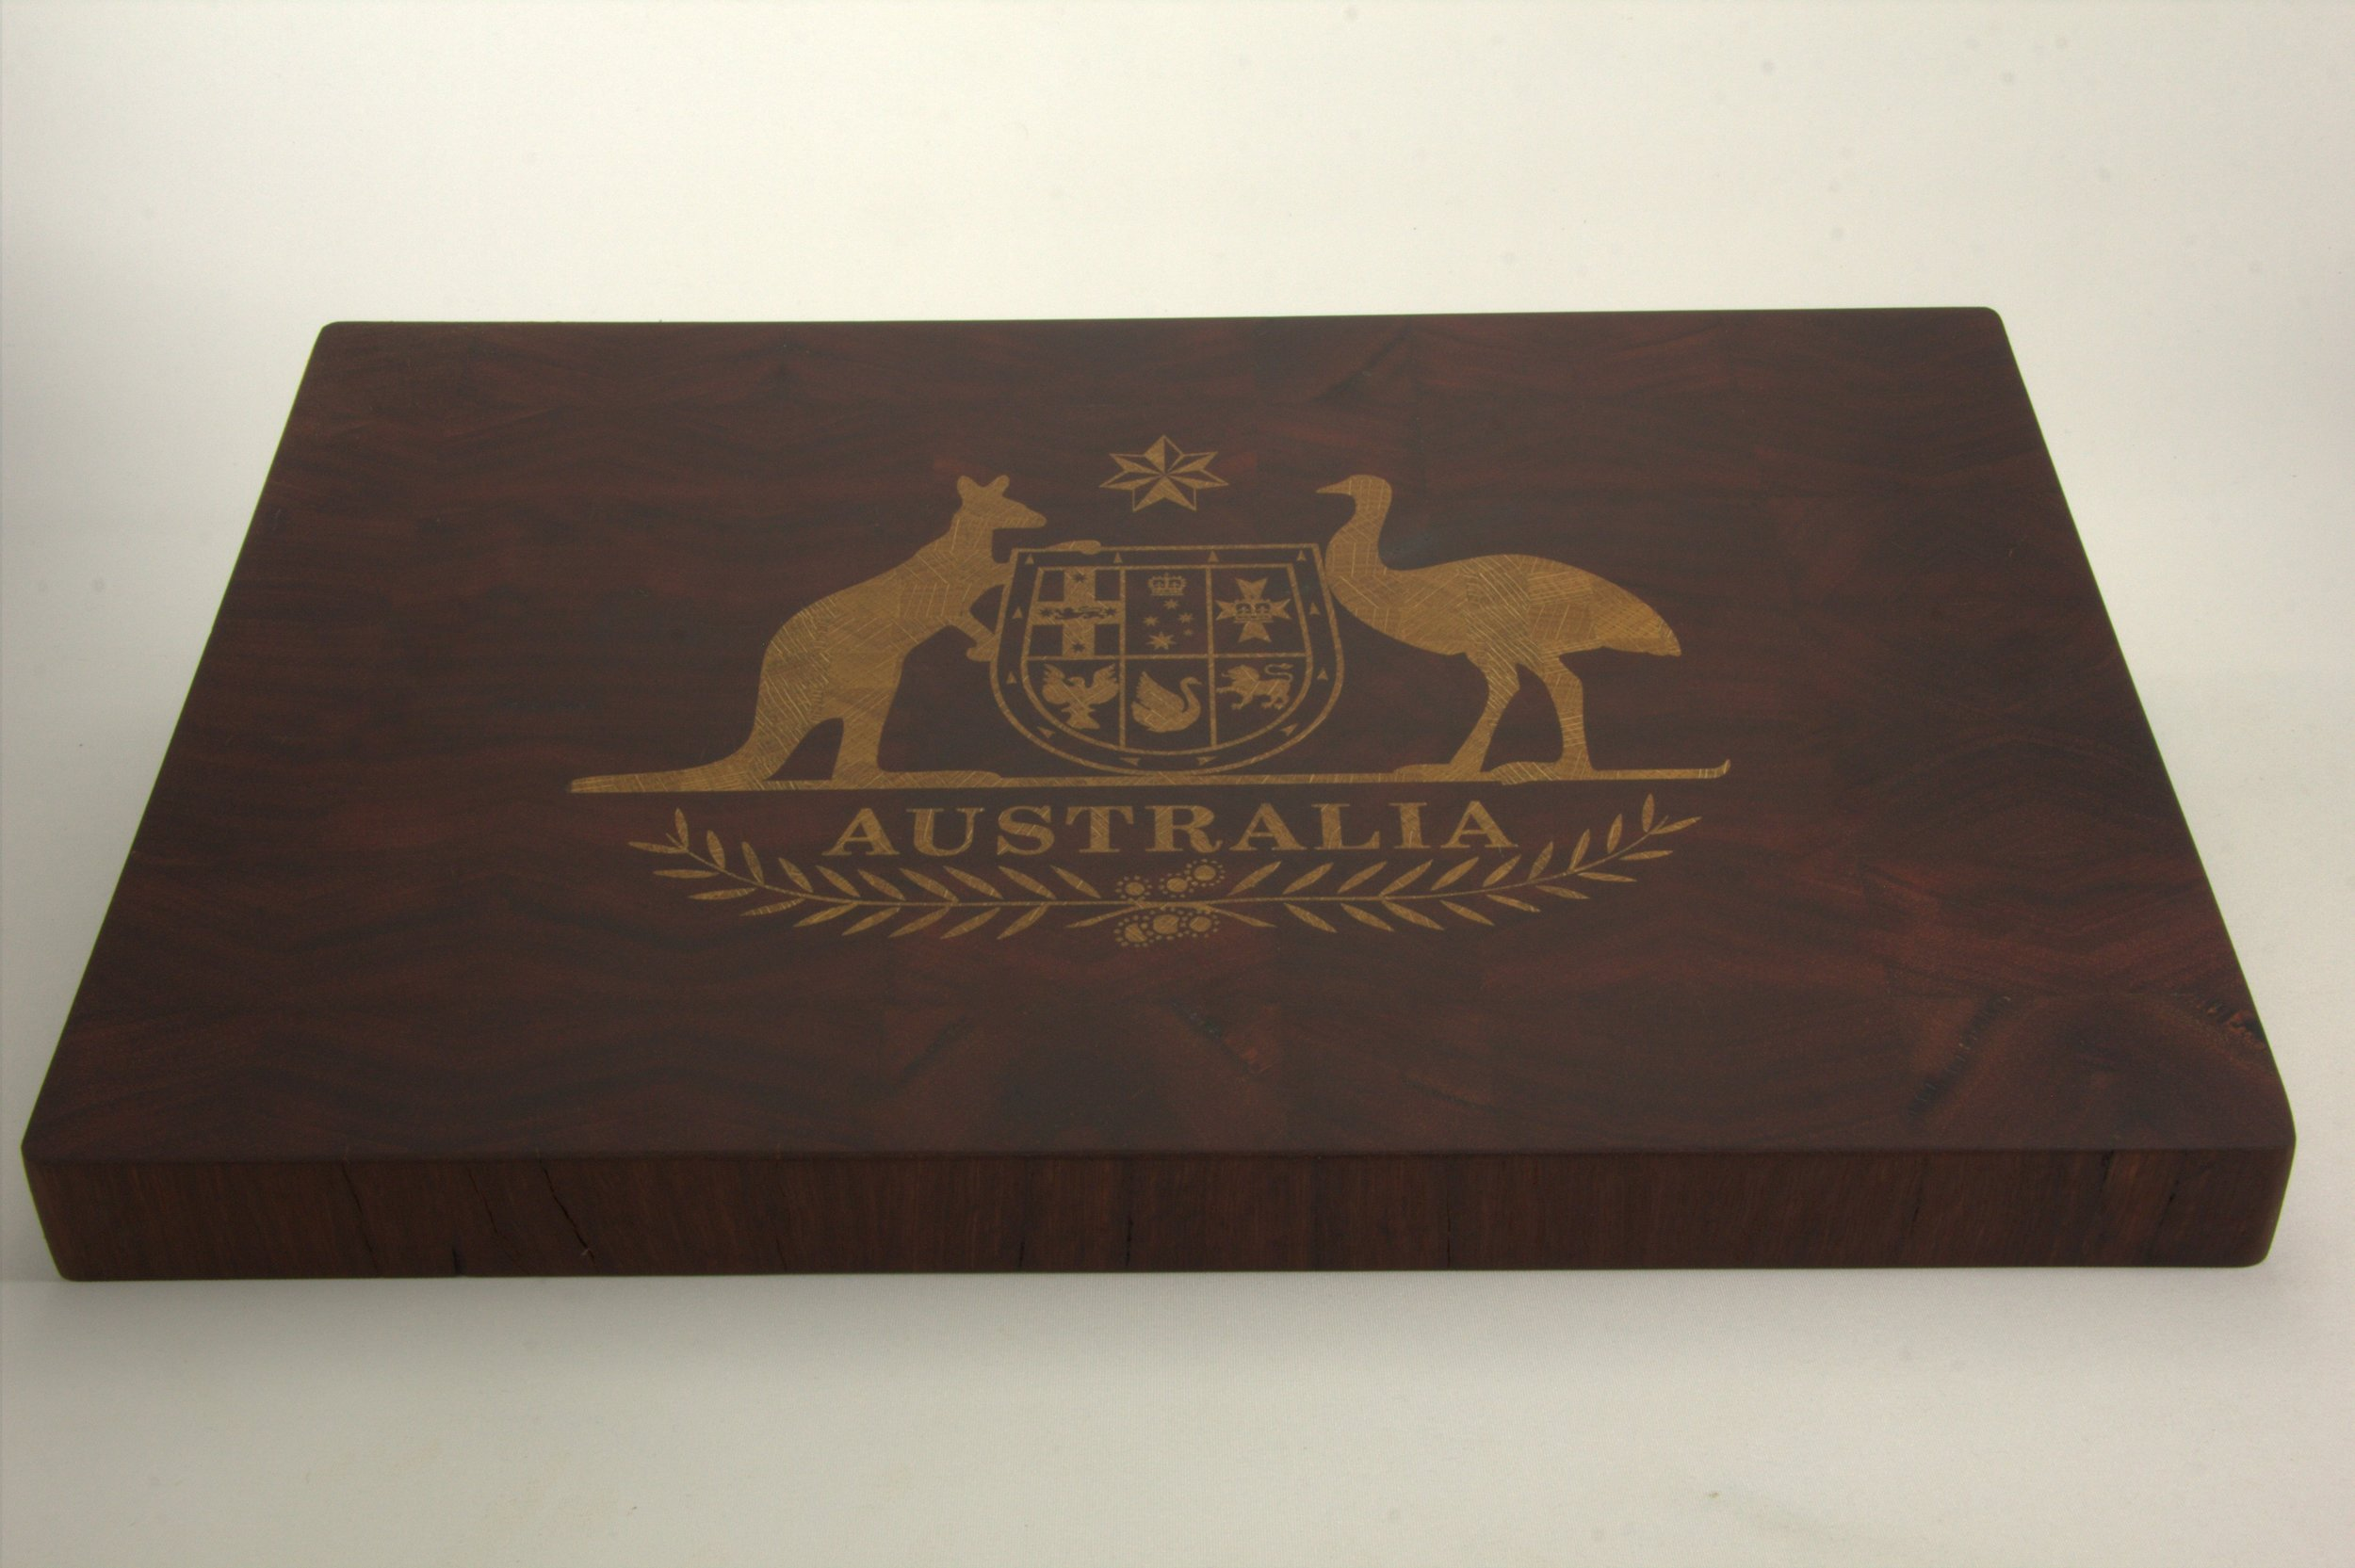 Jarrah Board with Tasmanian Oak Inlay